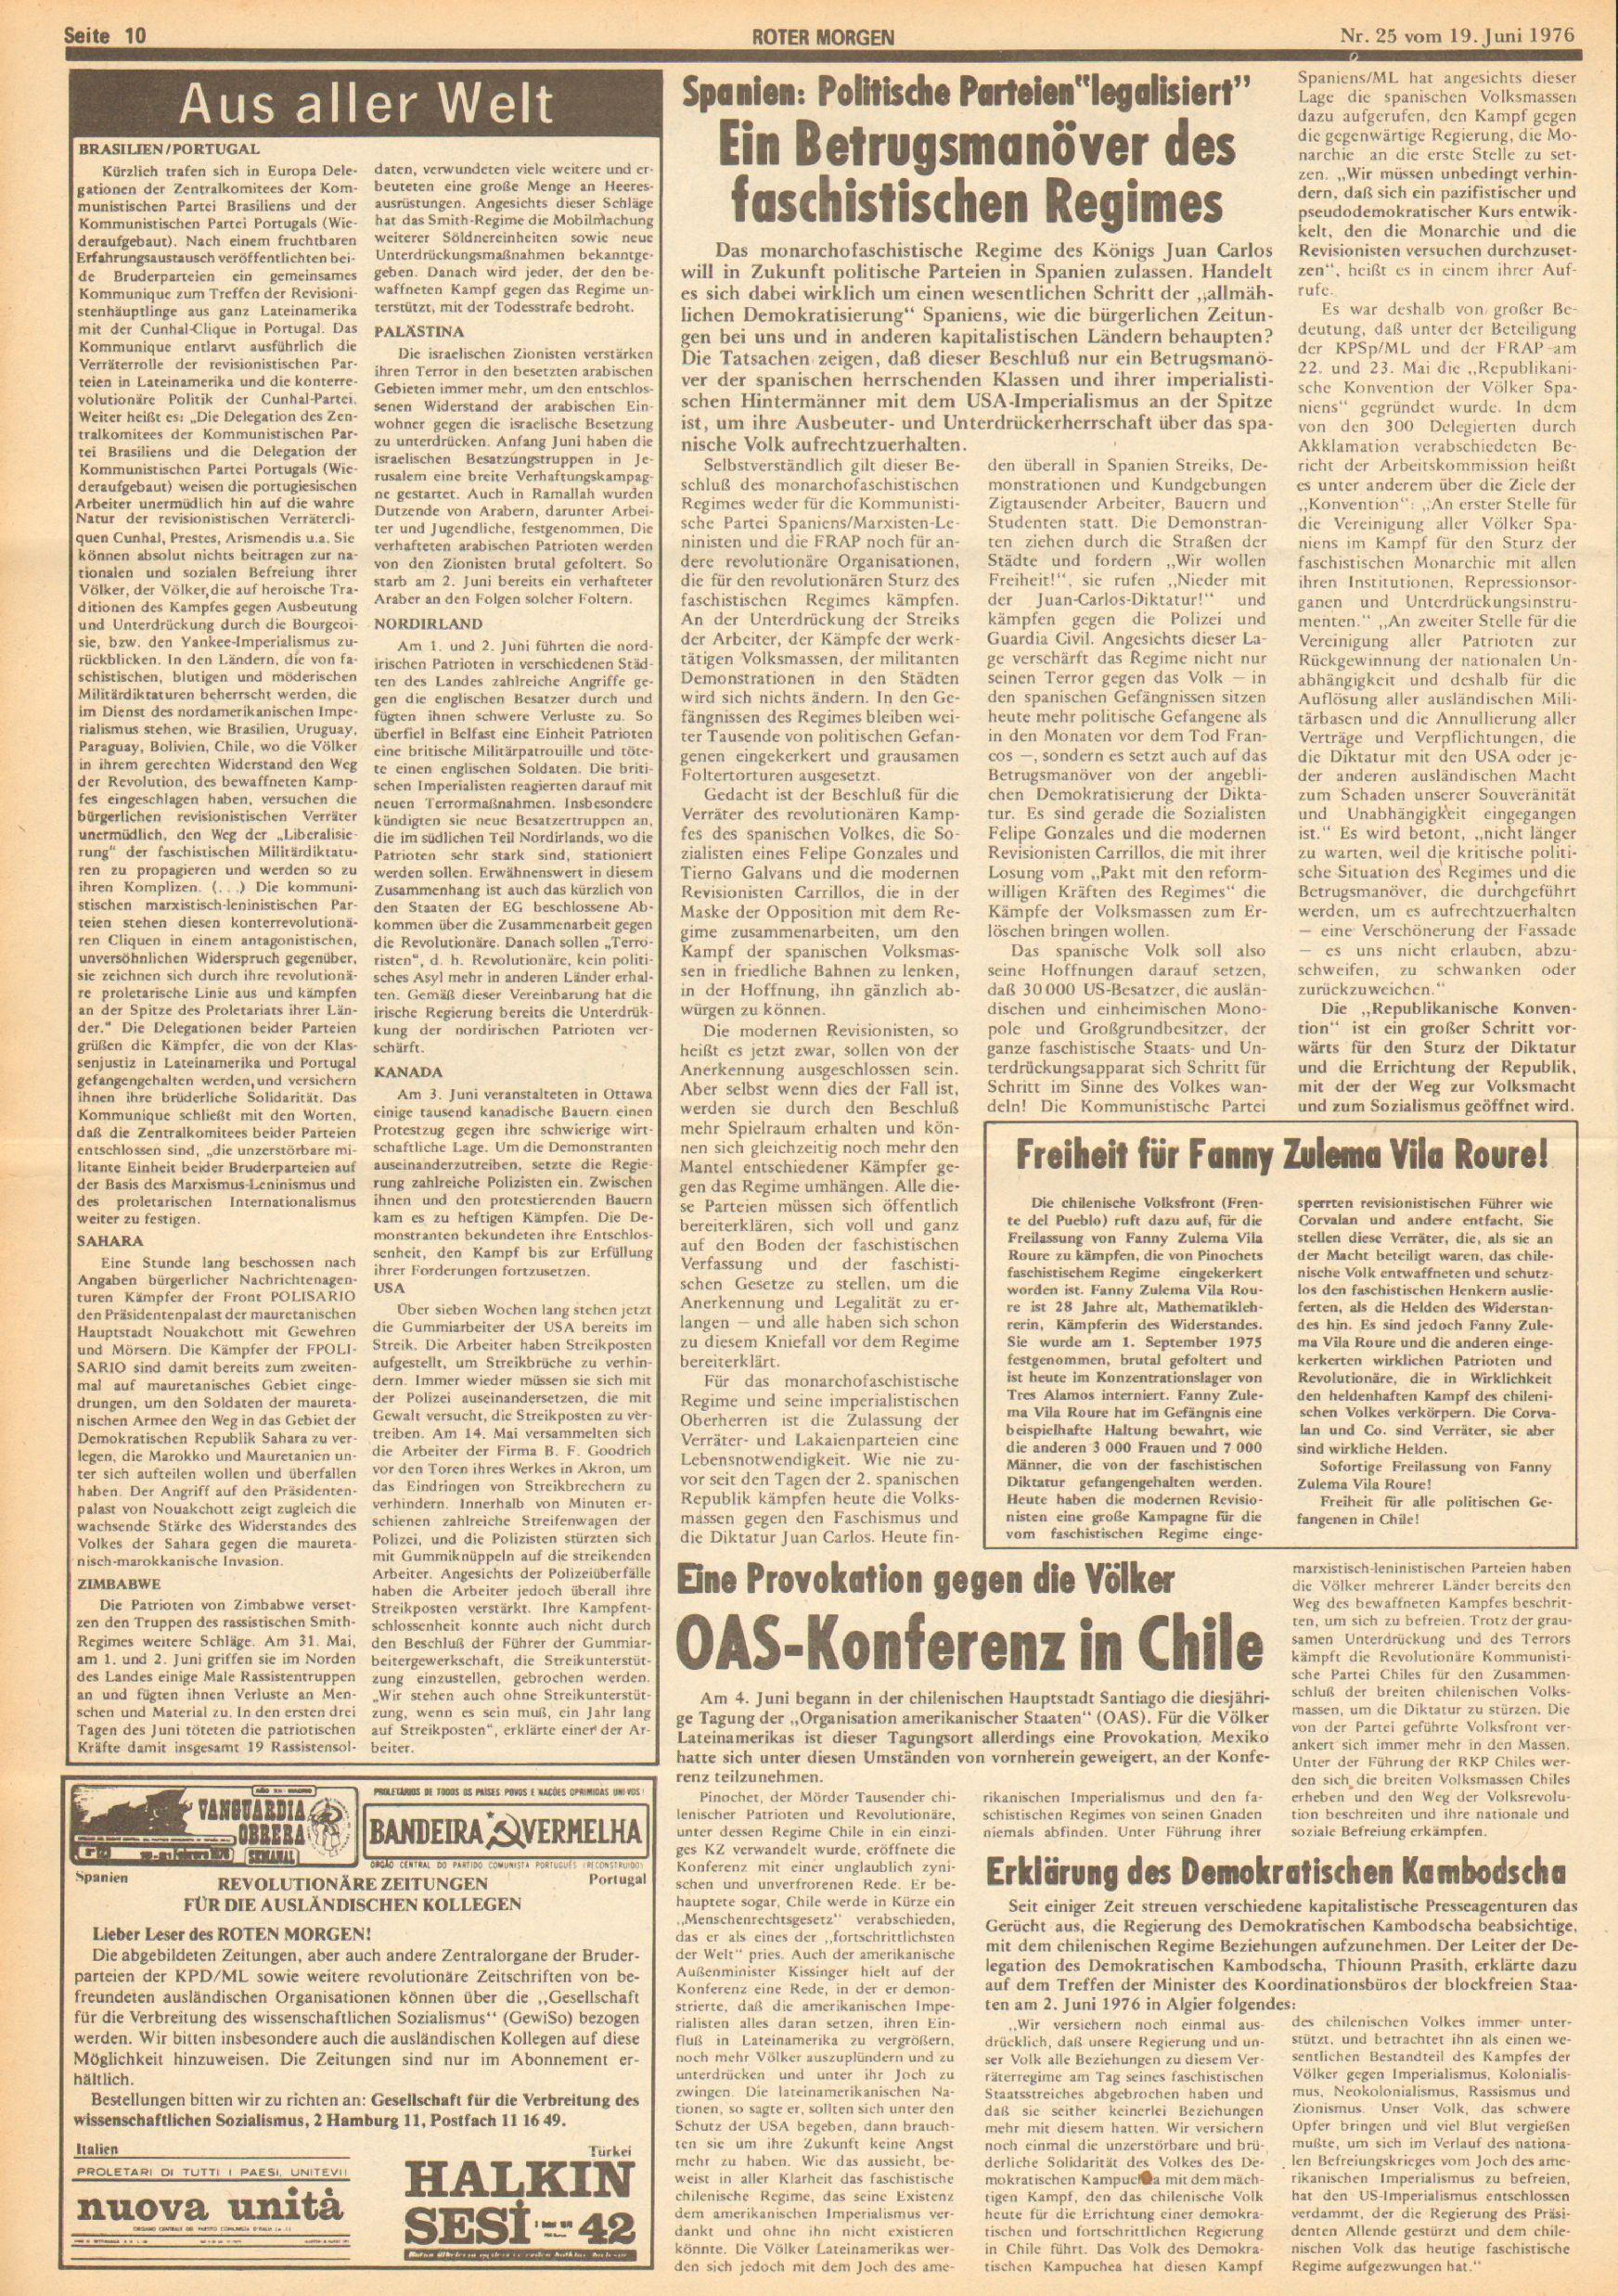 Roter Morgen, 10. Jg., 19. Juni 1976, Nr. 25, Seite 10